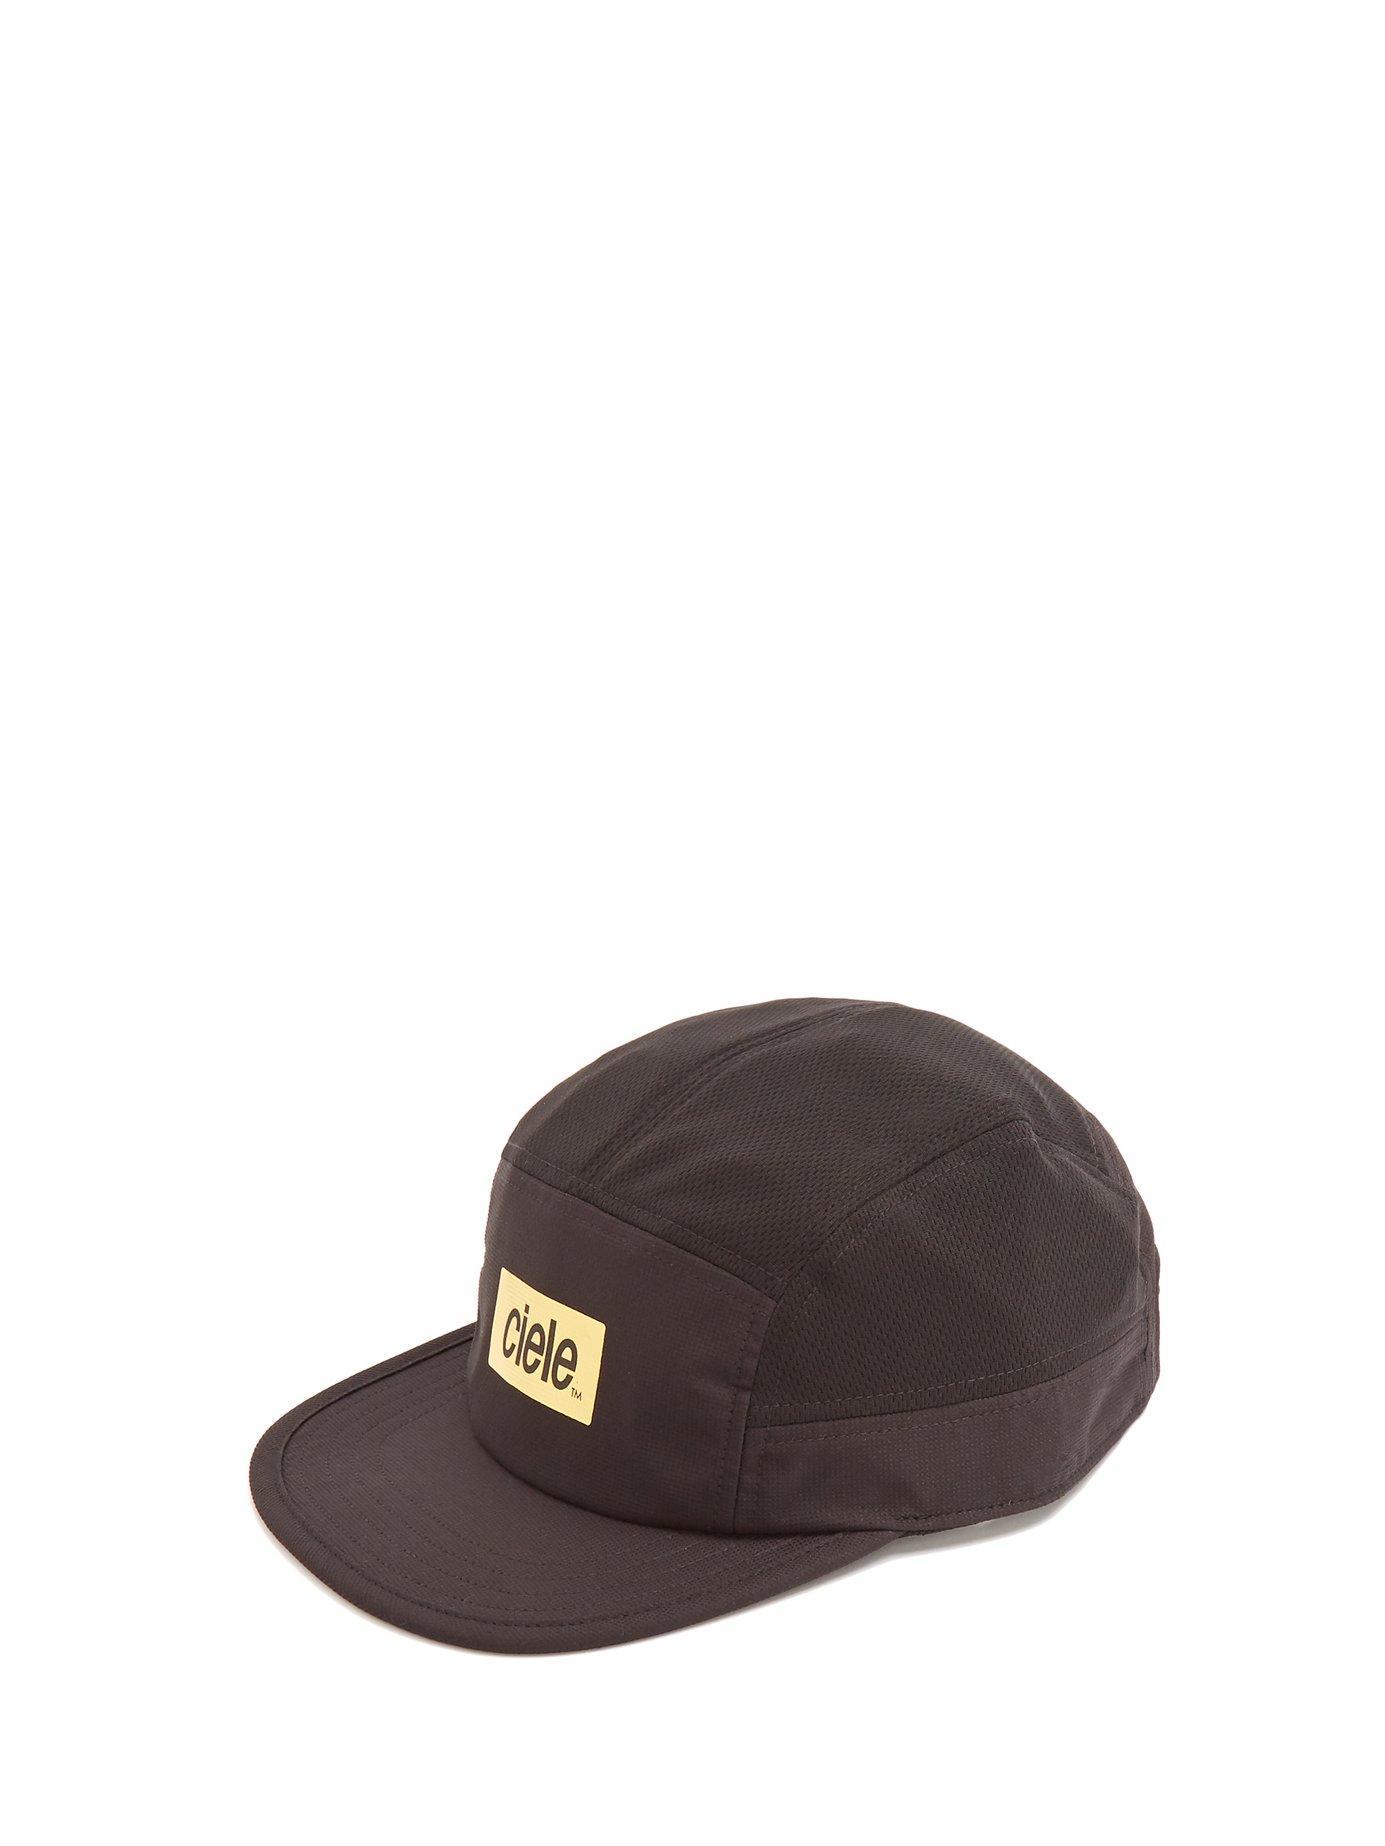 a03e8cc241f5b Chapeaux Ciele Athletics FST Cap Decade Whitaker Edition Running Fitness  Black Hat